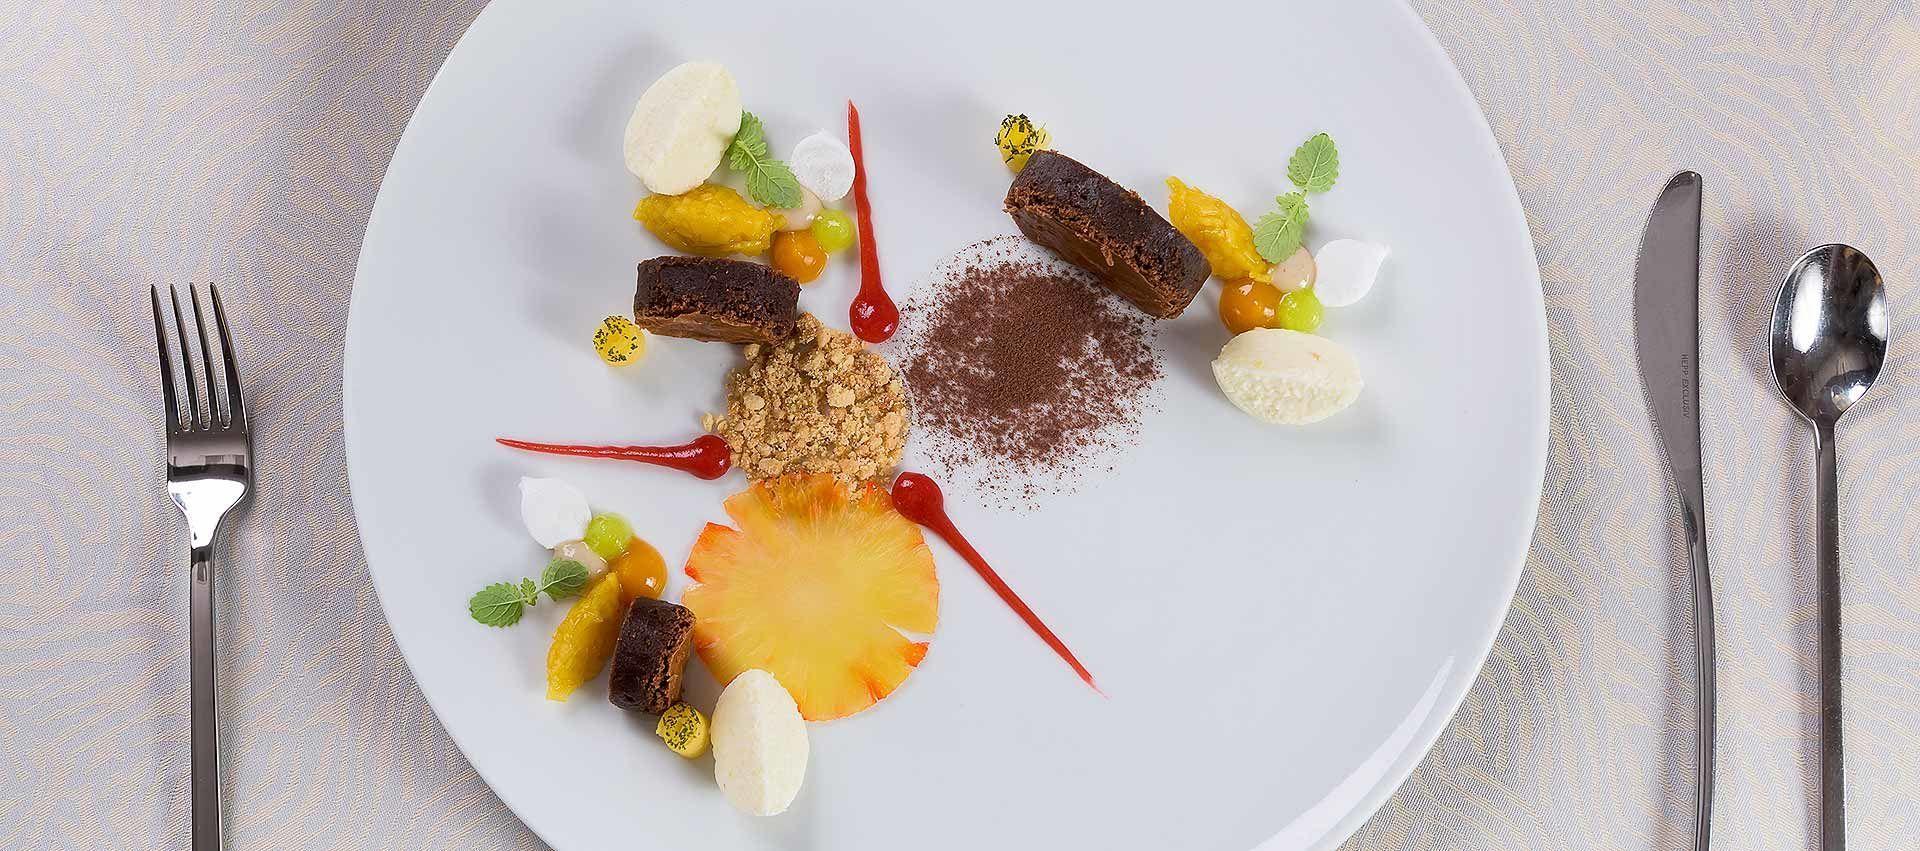 315_Dessert_Rodos_Palladium_55a_q20_result